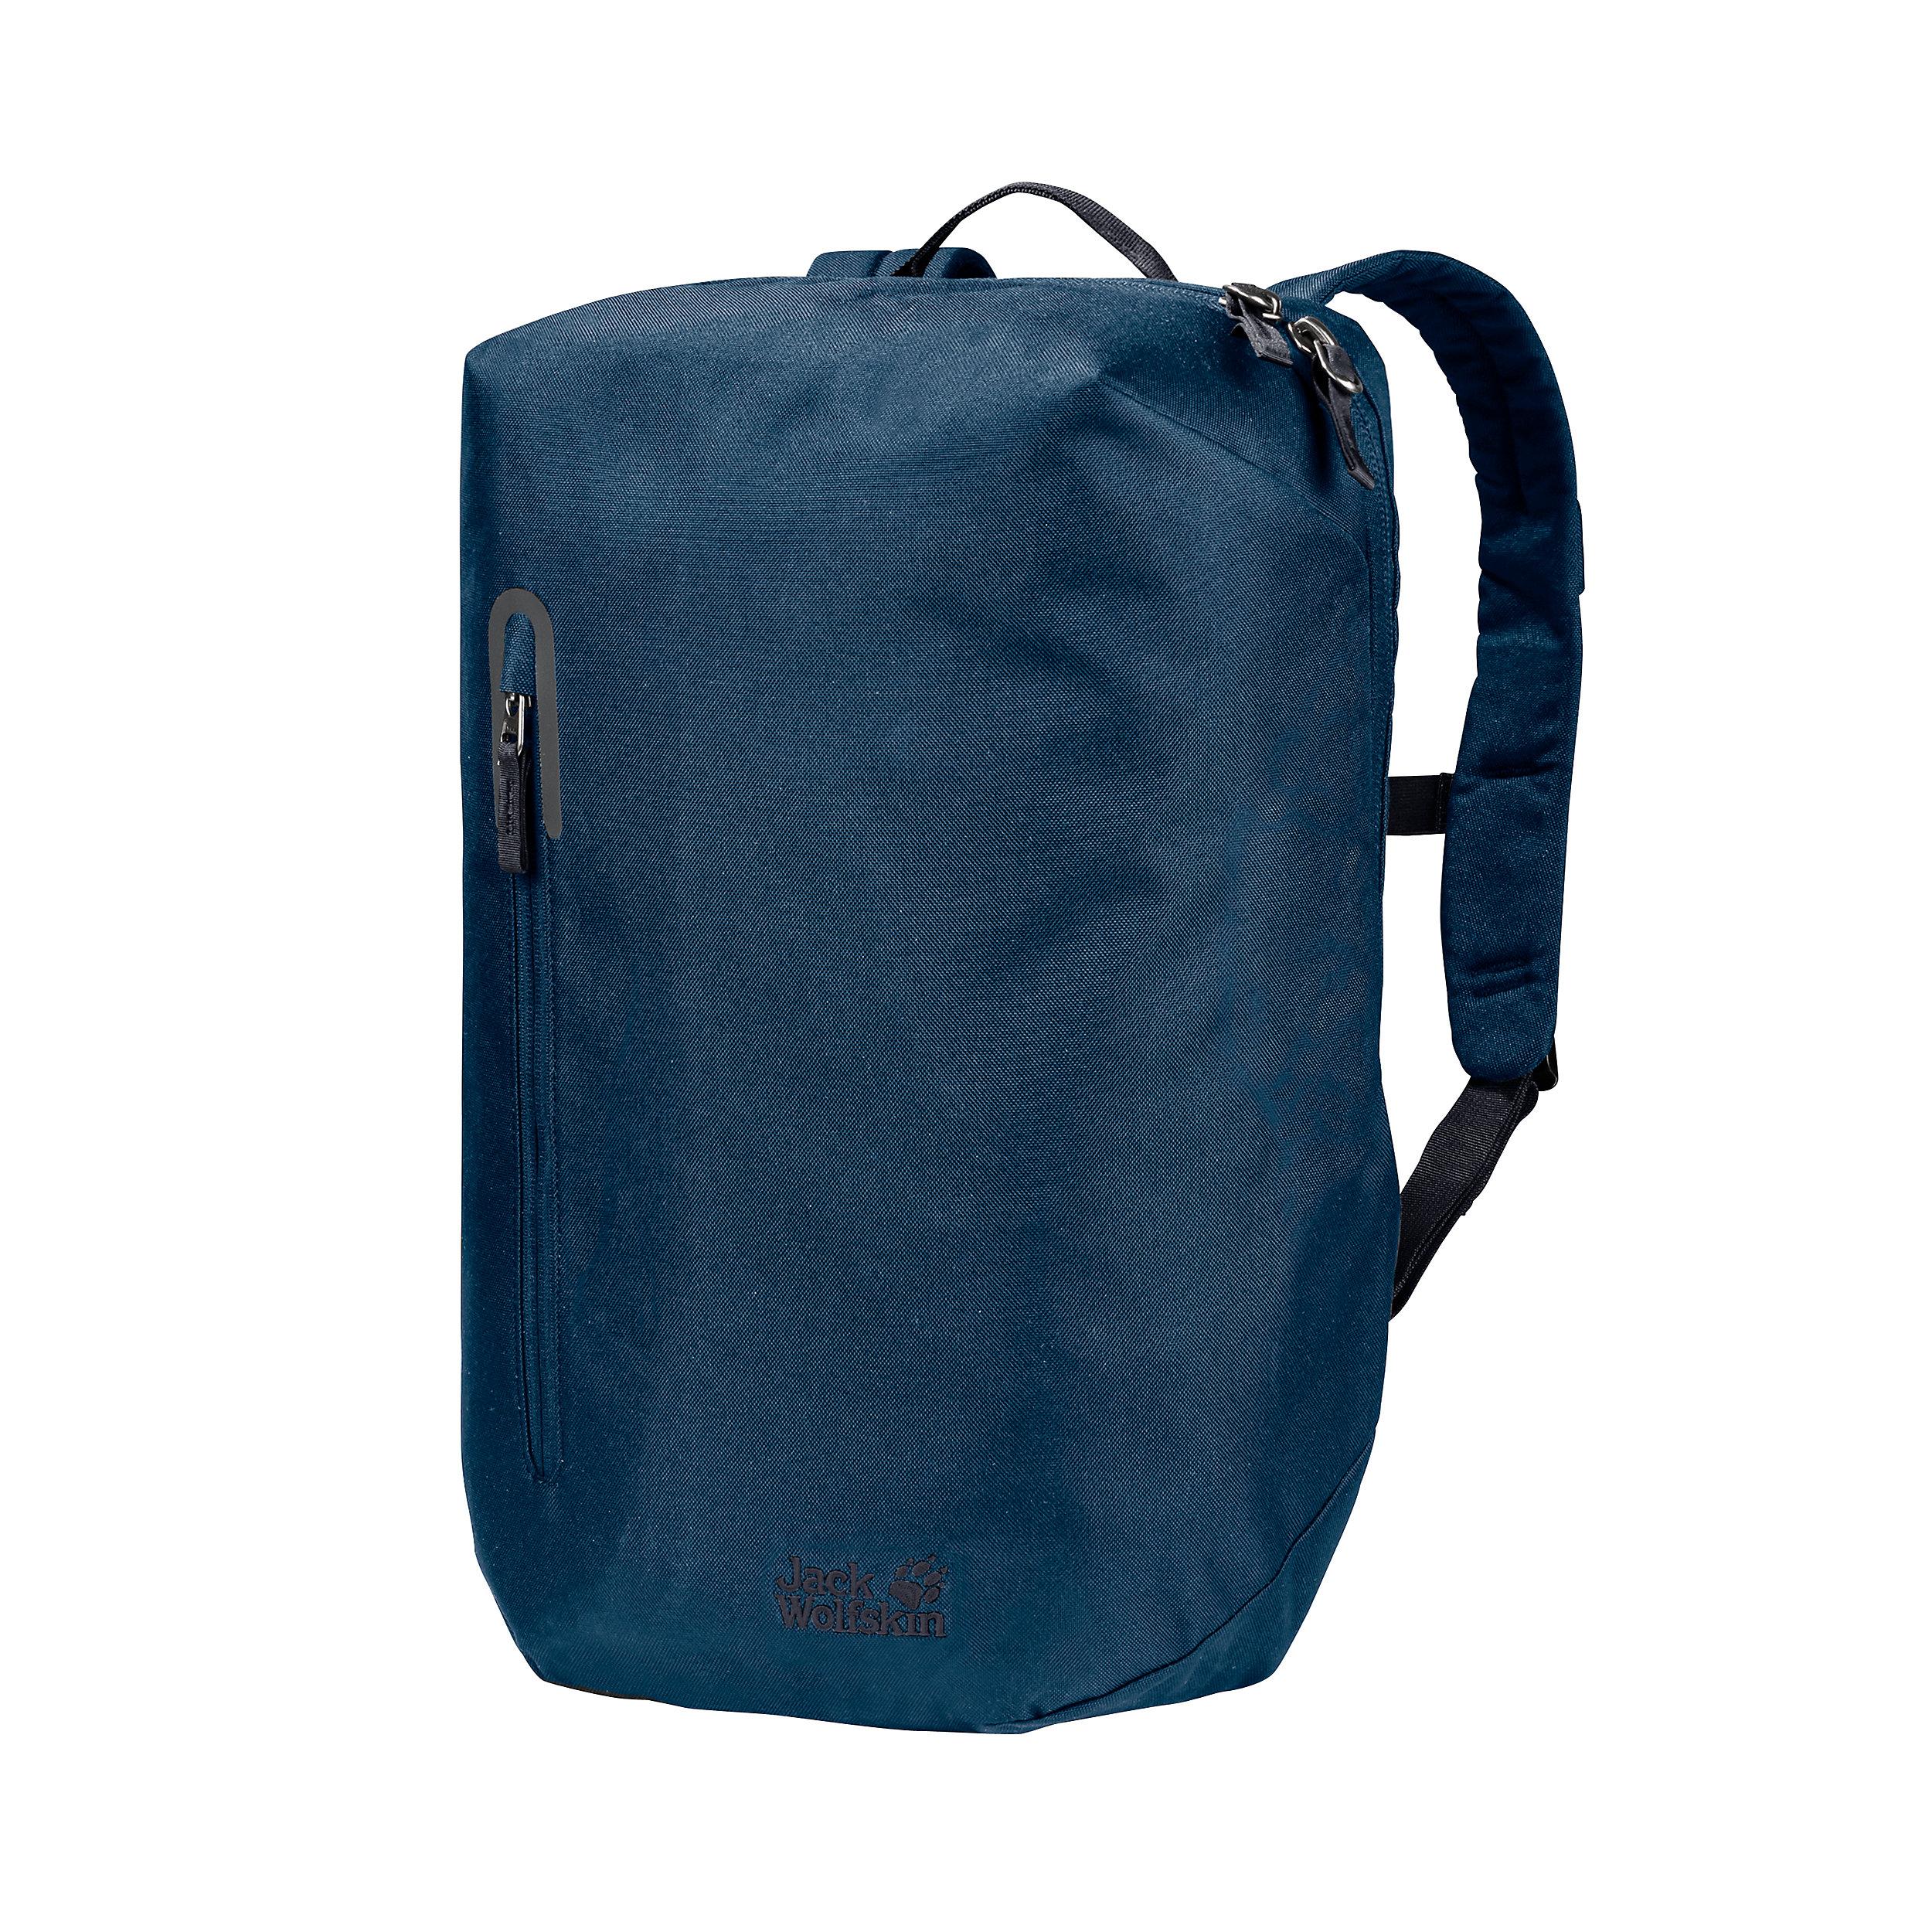 "Backpack Bondi 14"" Everyday Outdoor M 20 Liter"